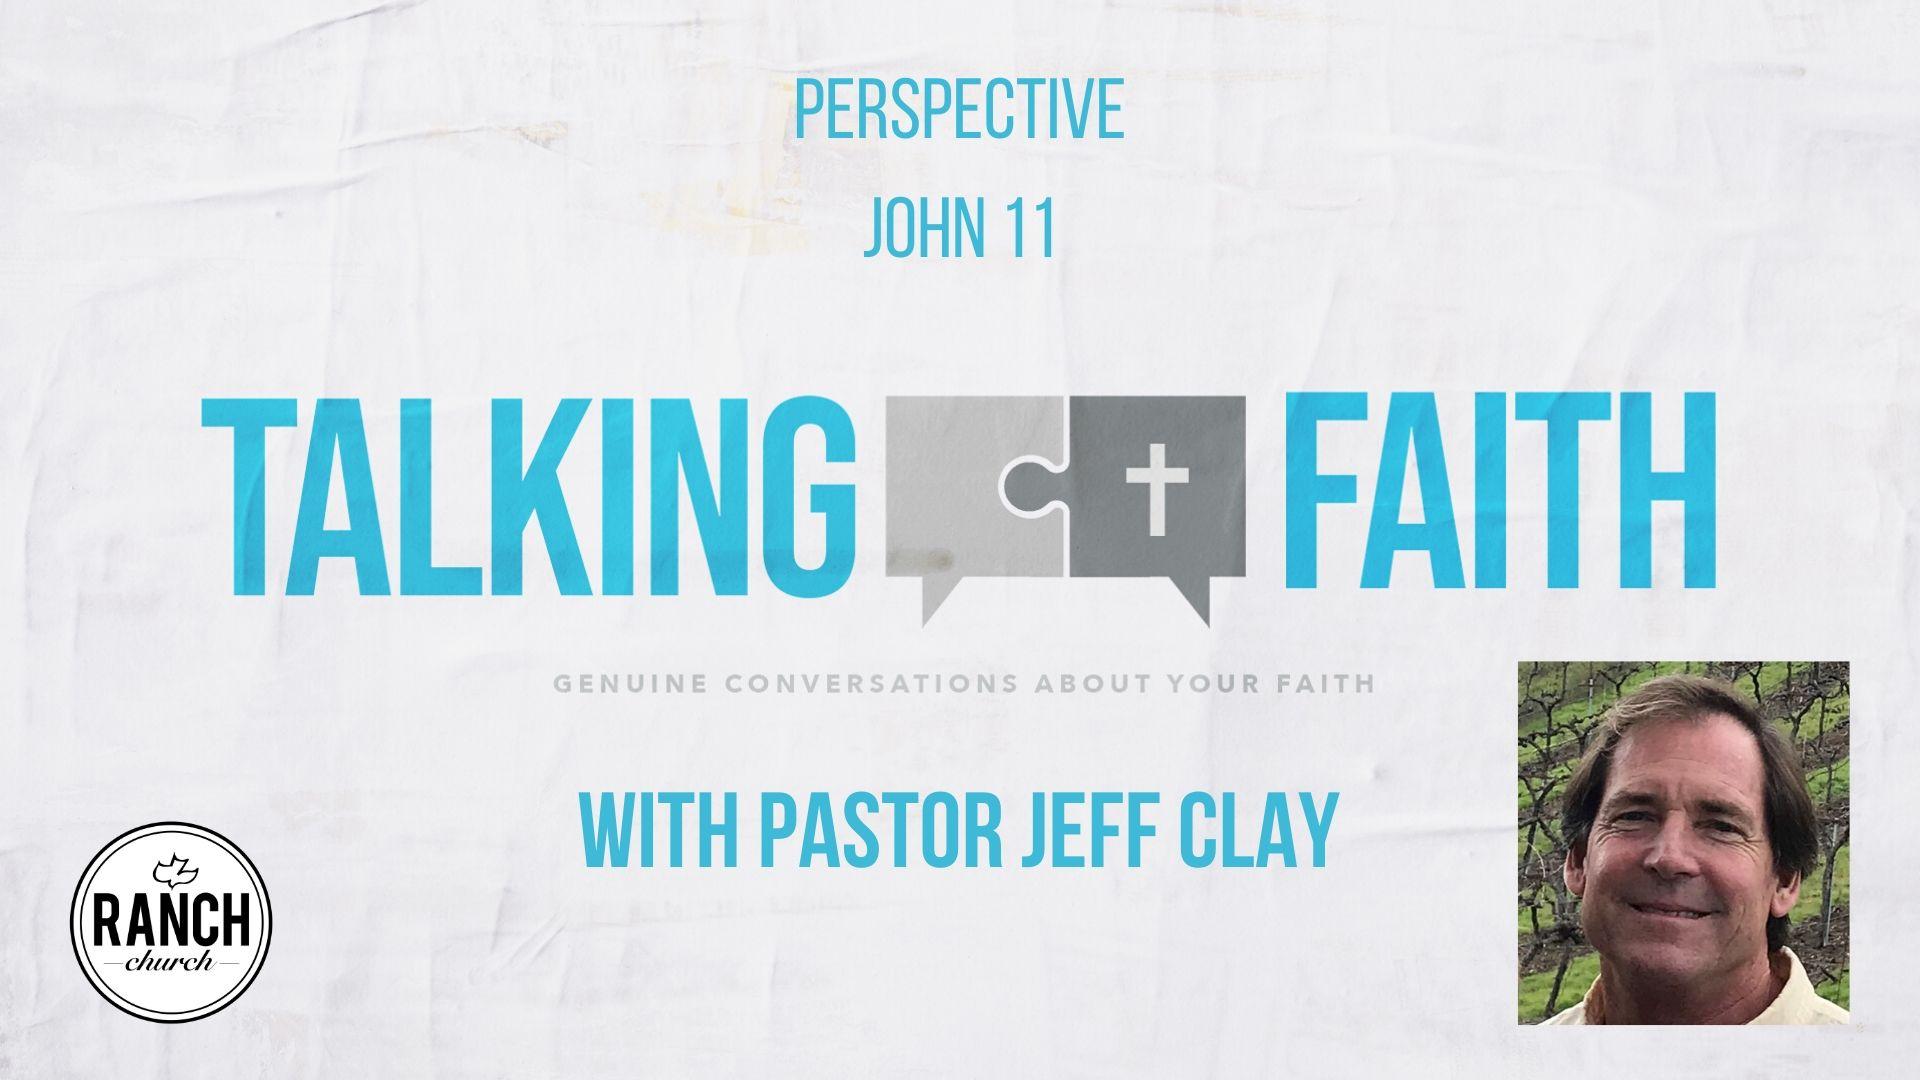 TALKING FAITH 5-26-2020